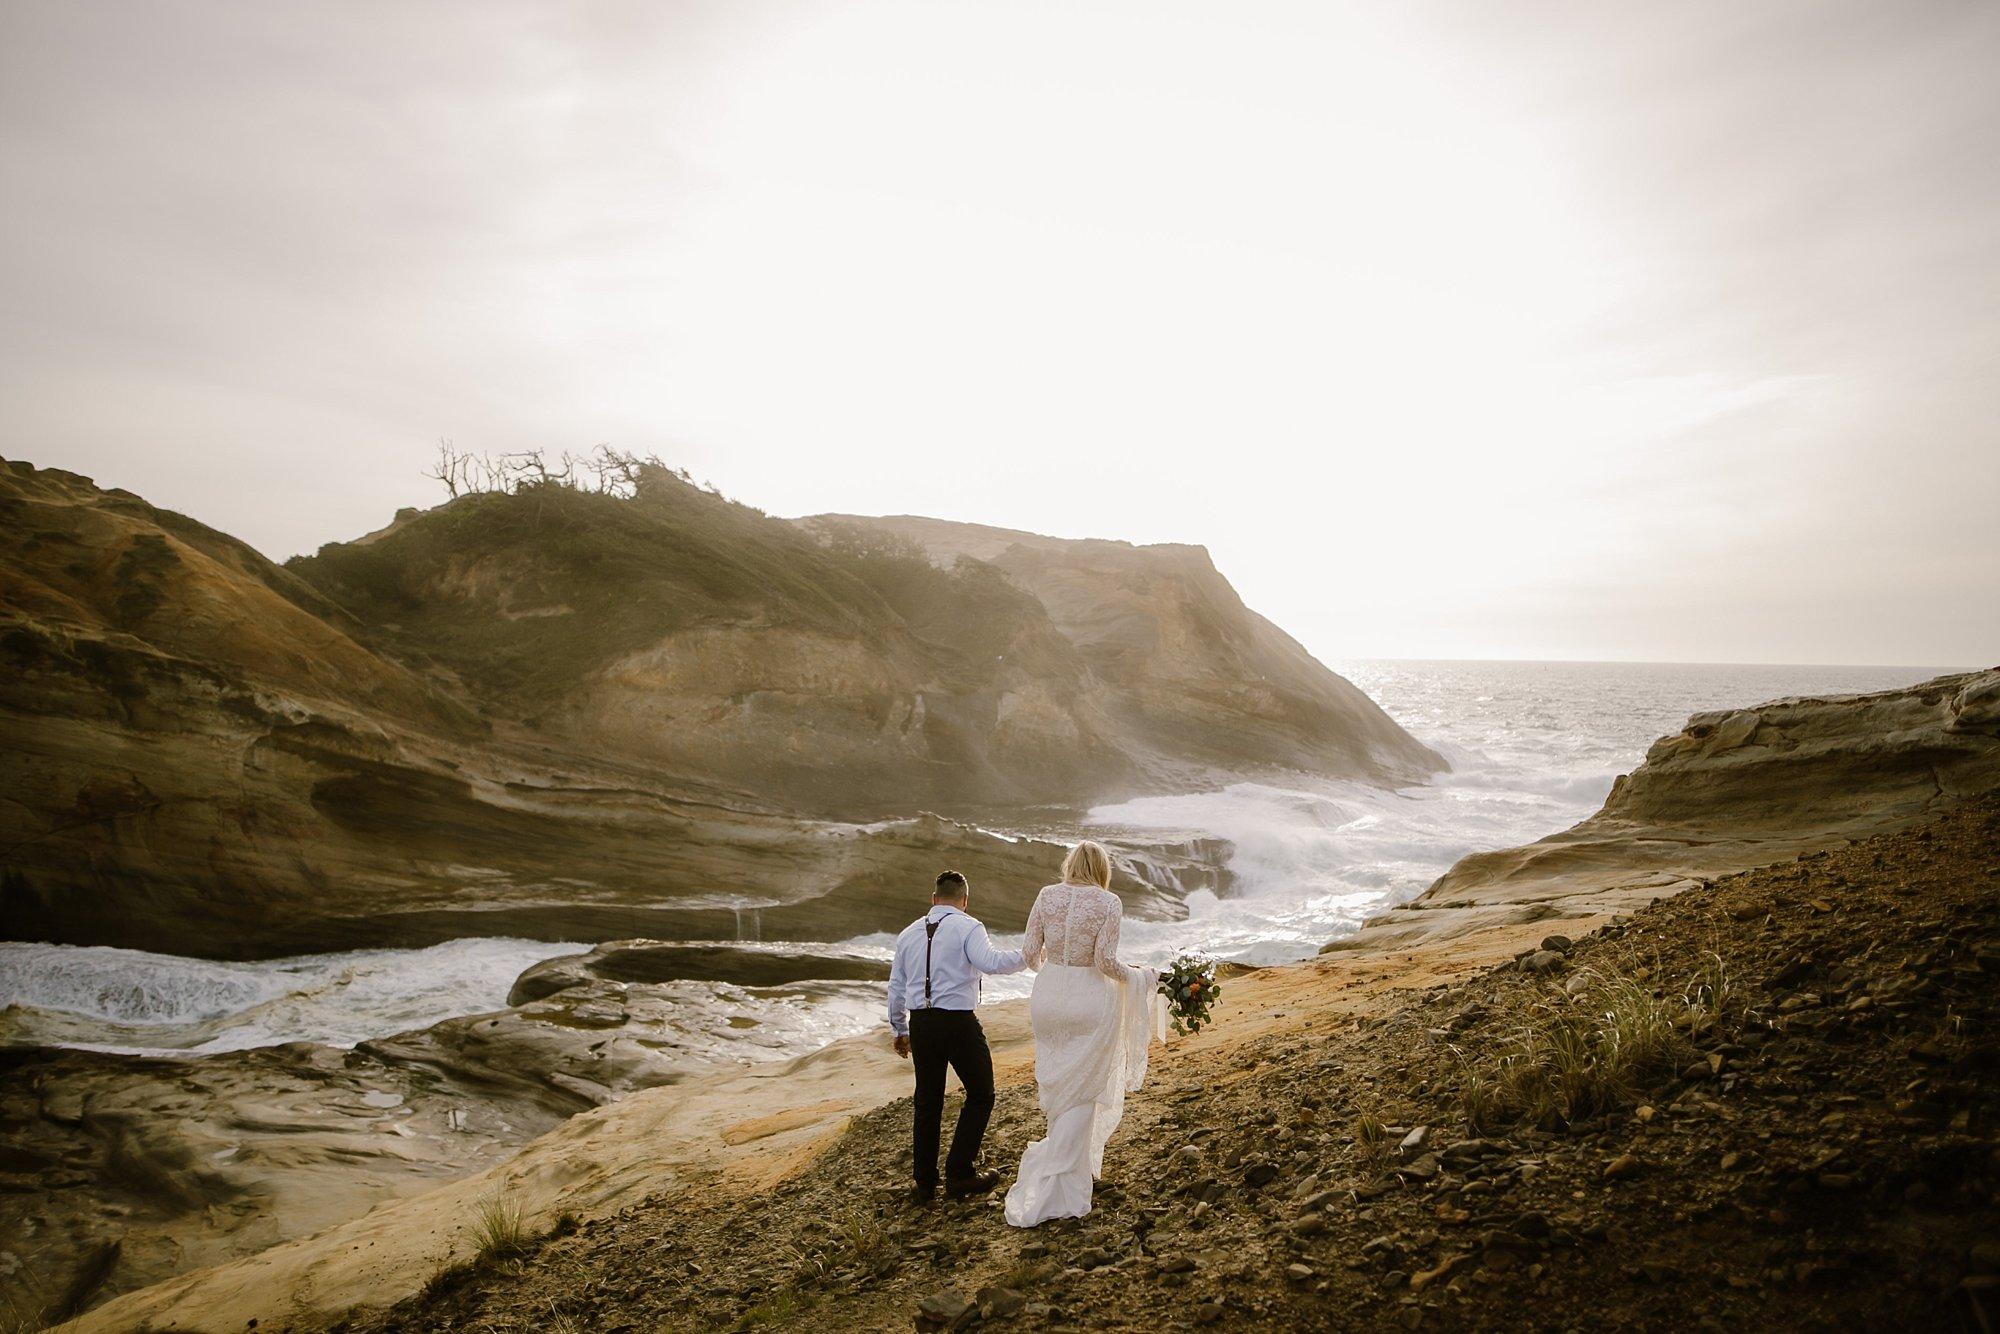 A beach elopement wedding photo at Cape Kiwanda